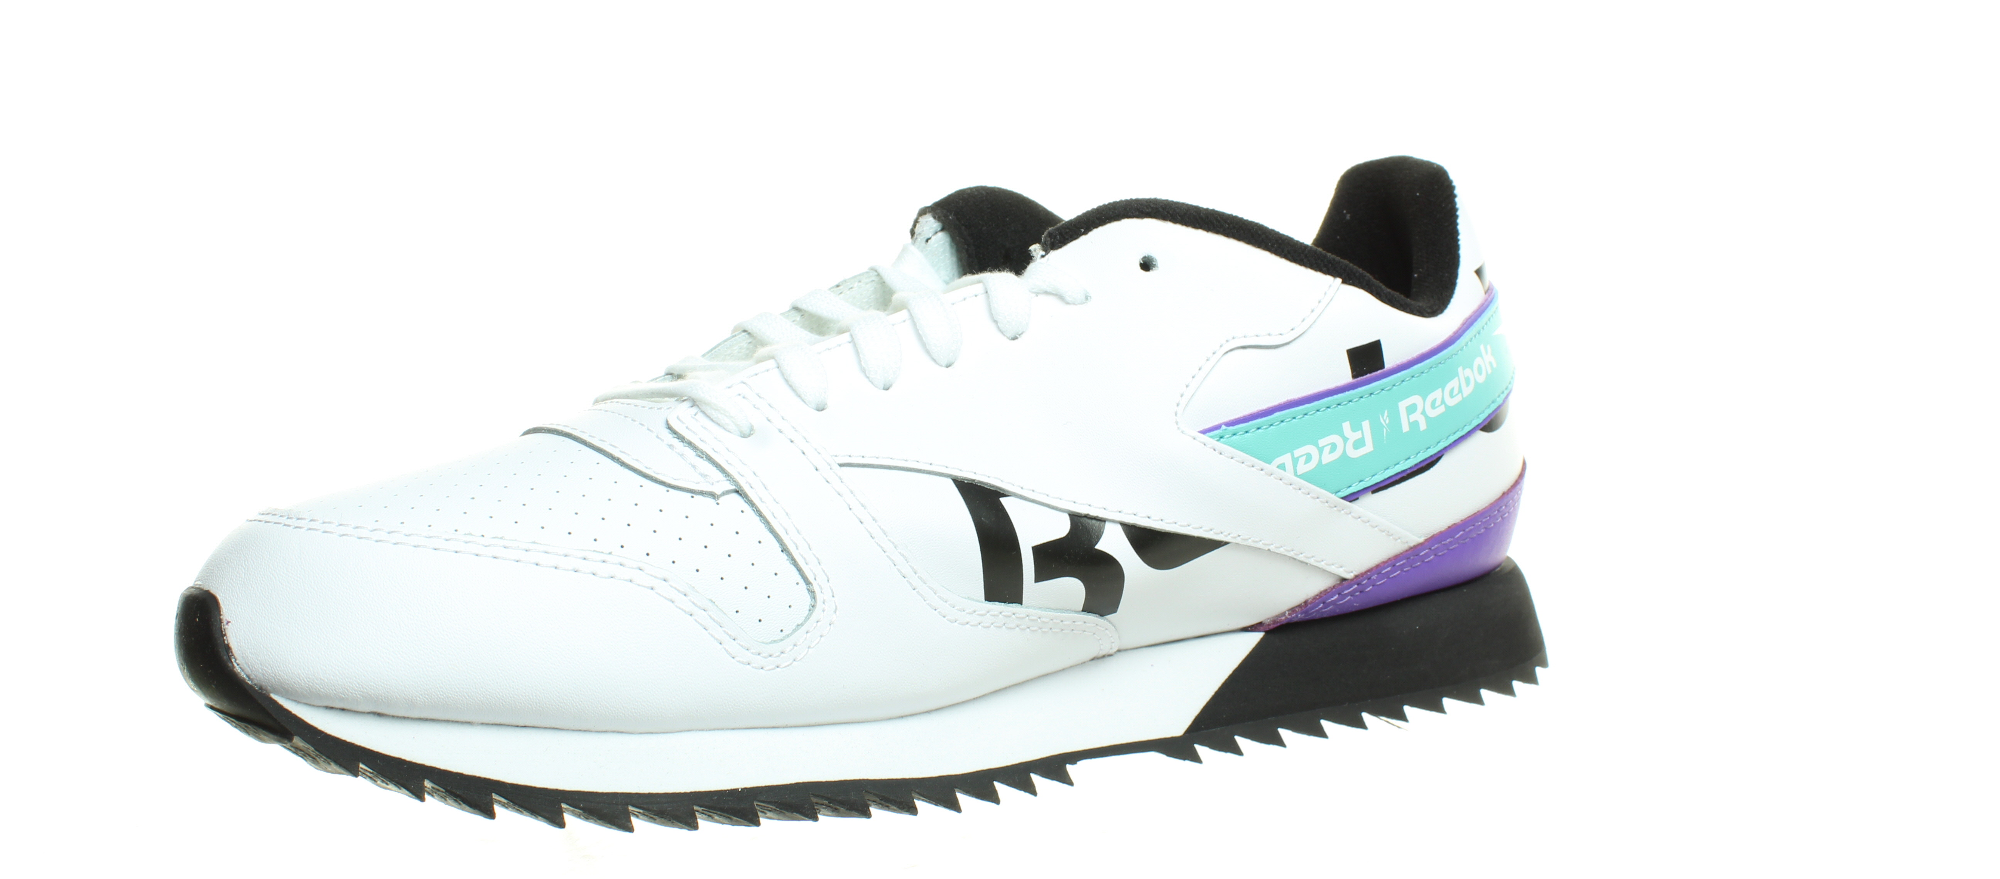 Reebok-Mens-Classic-Leather-Ripple-Fashion-Sneakers thumbnail 19